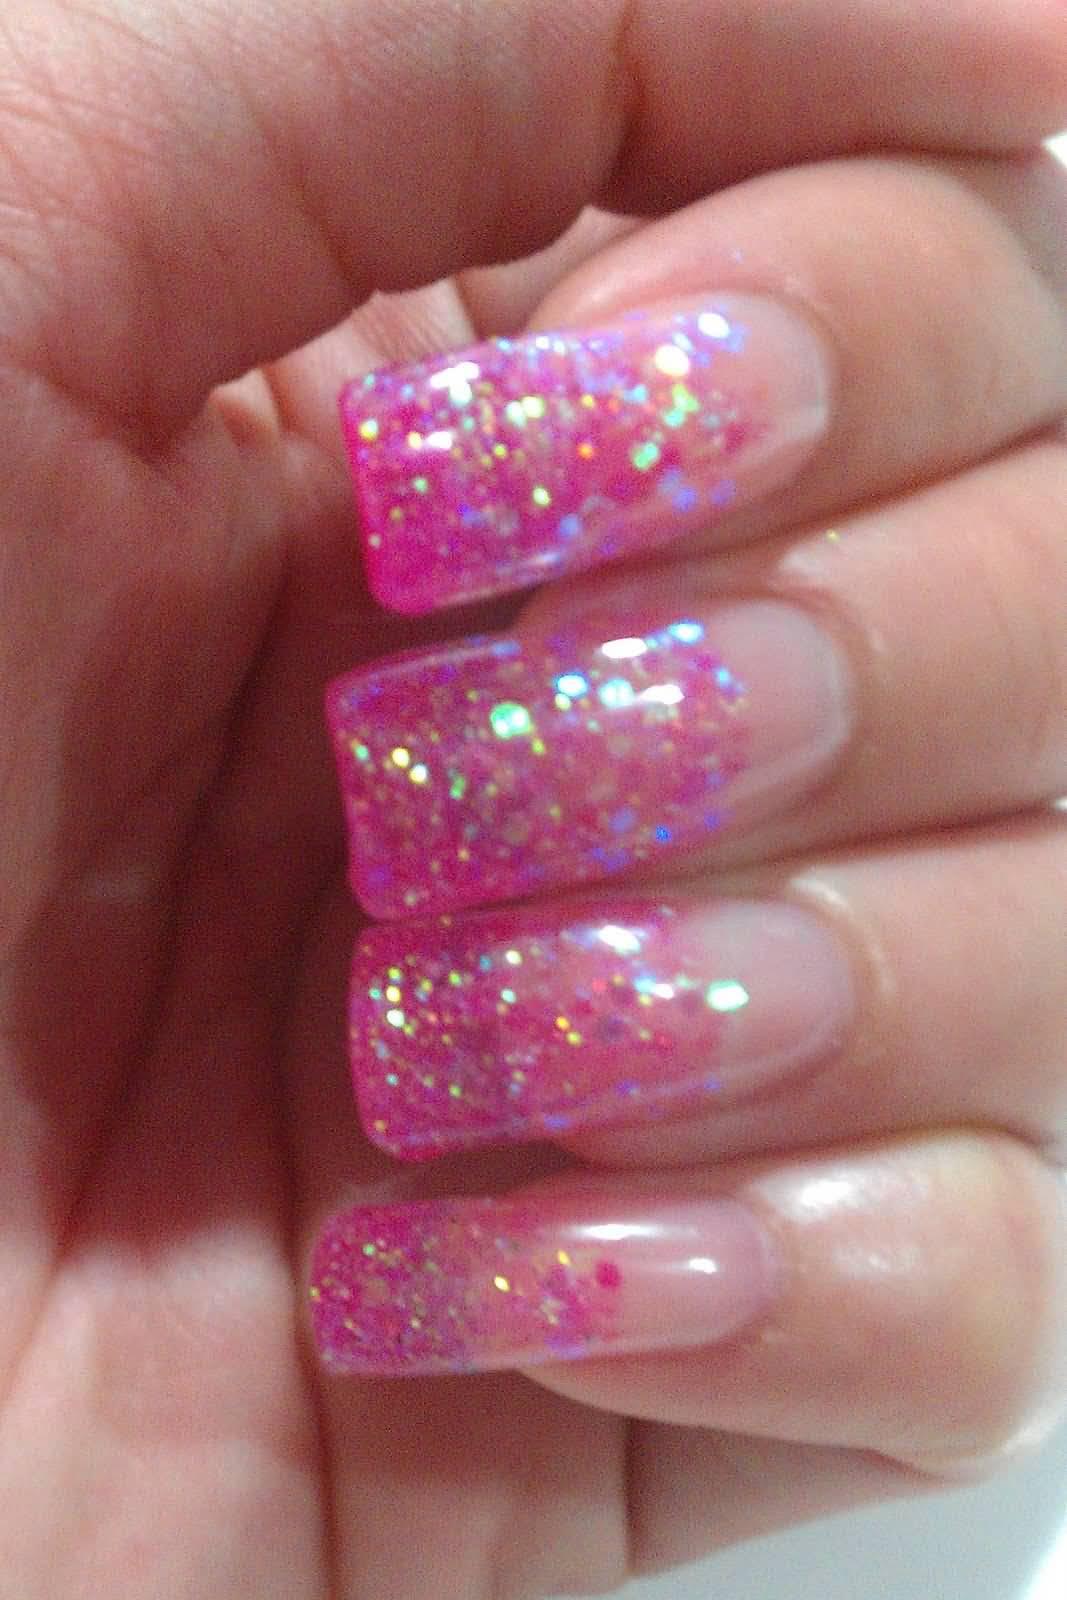 52 classic glitter nail art design ideas for trendy girls pink glitter gel nail art design idea prinsesfo Choice Image